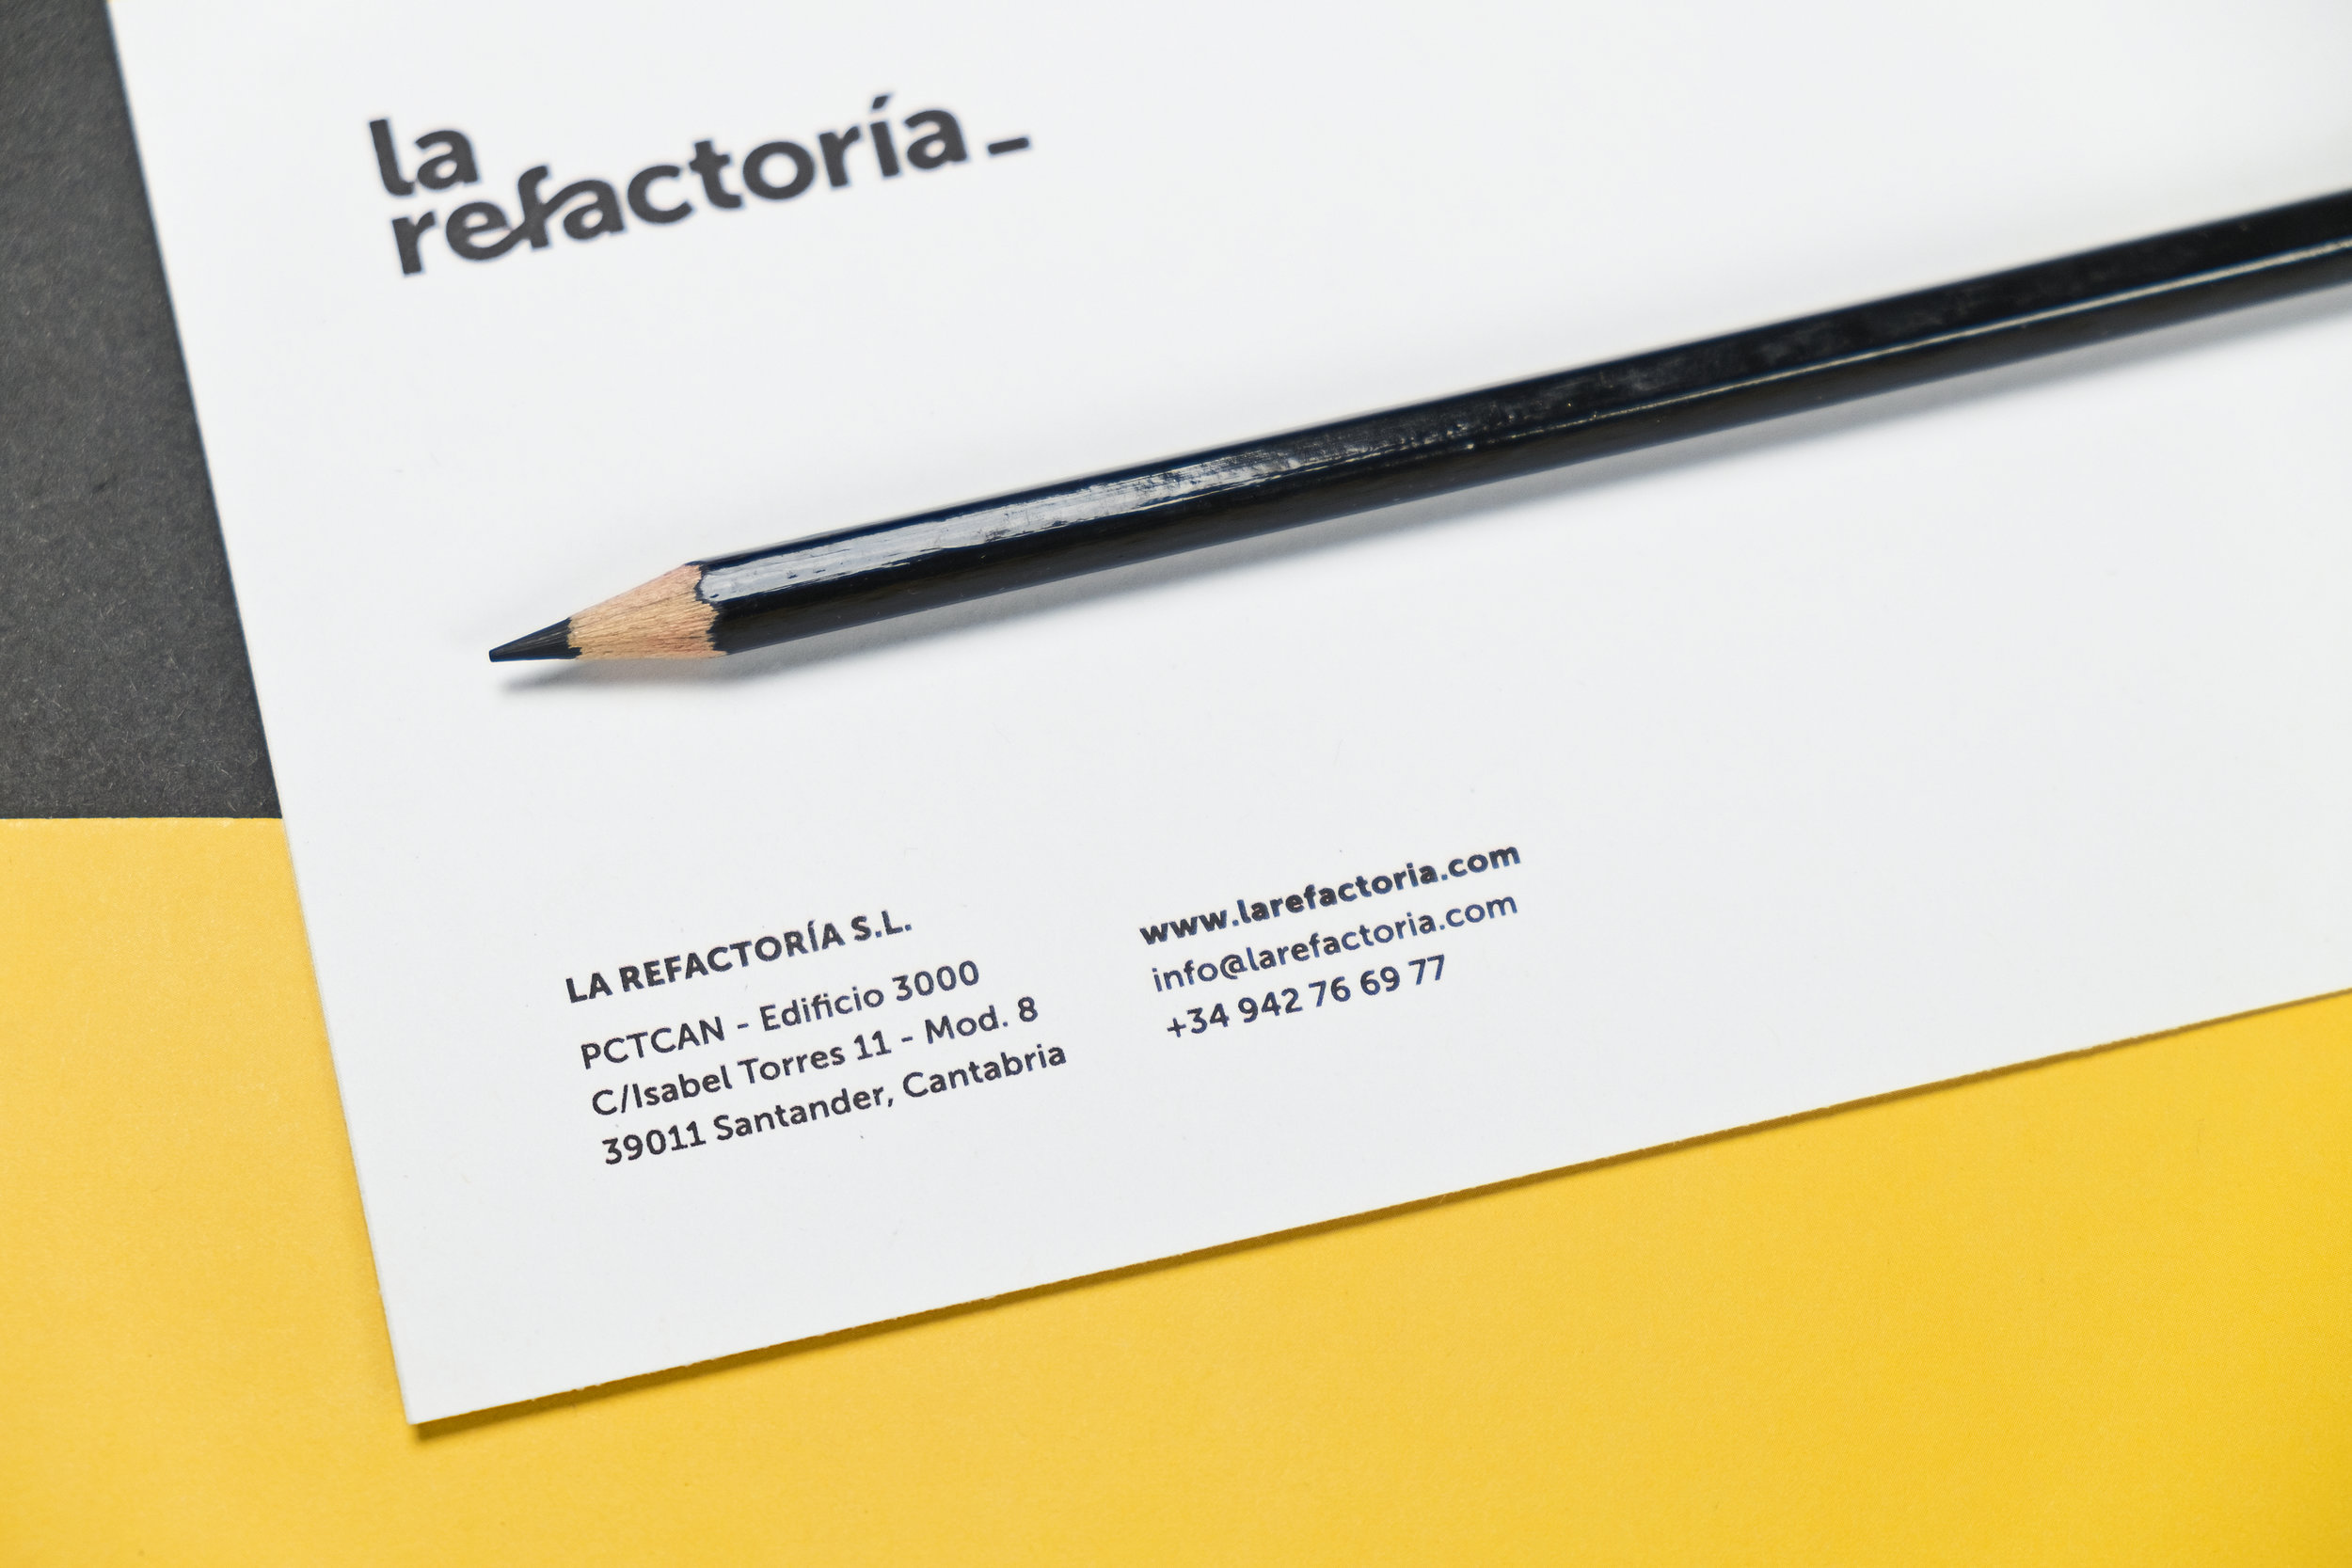 La Refactoria055.jpg